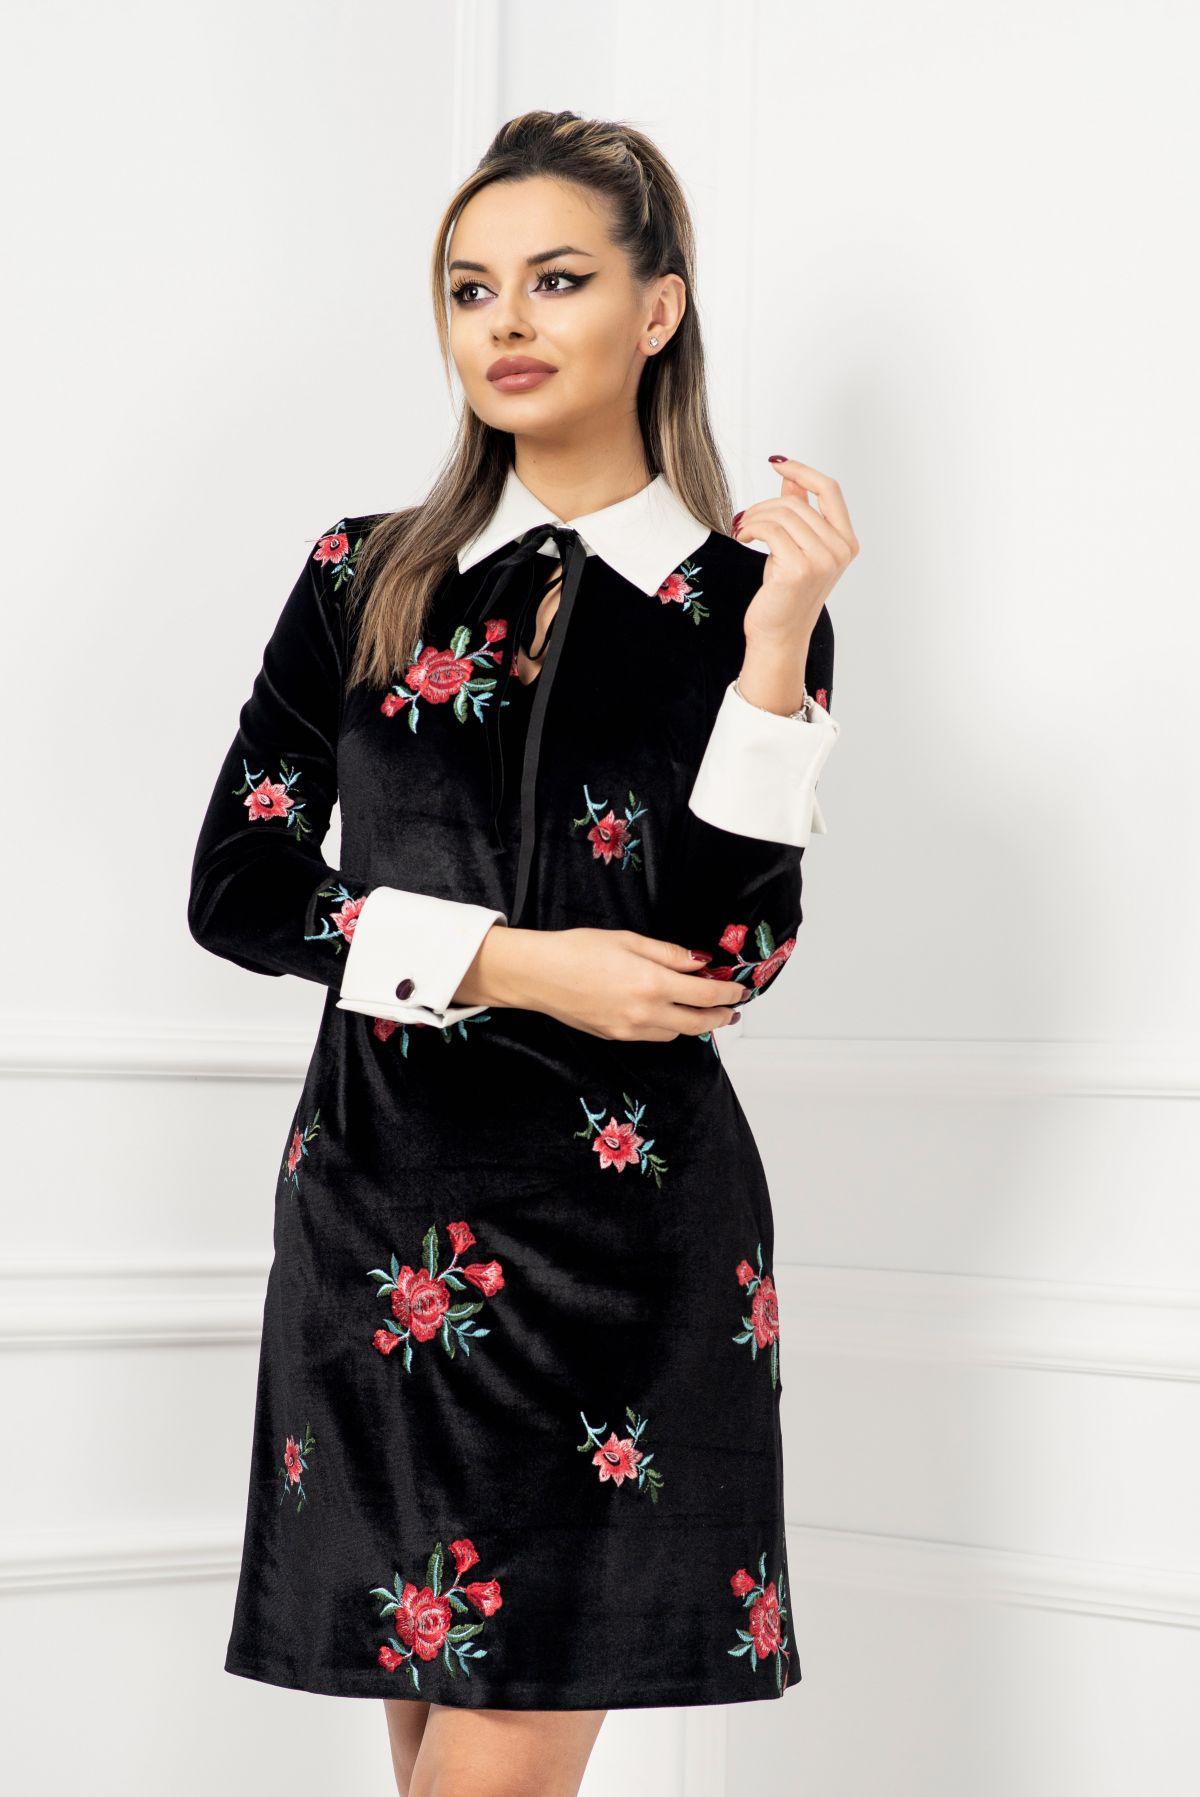 Rochie din catifea cu broderie florala si guler si mansete albe MBG-Collection